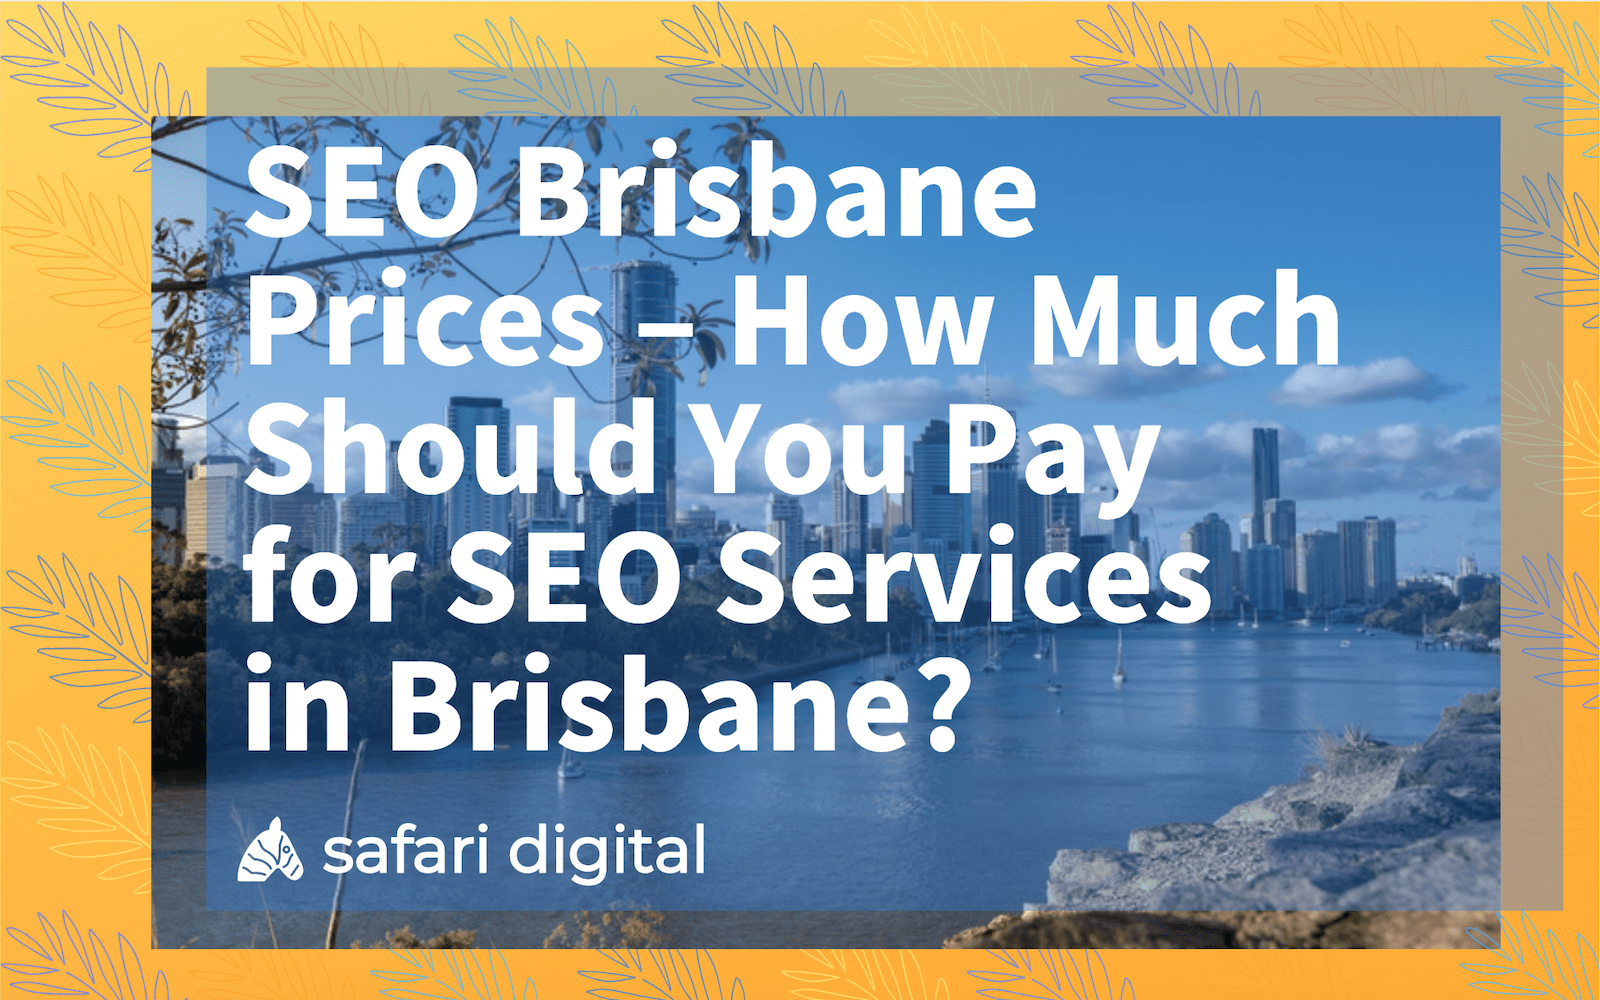 SEO Brisbane Services cover image